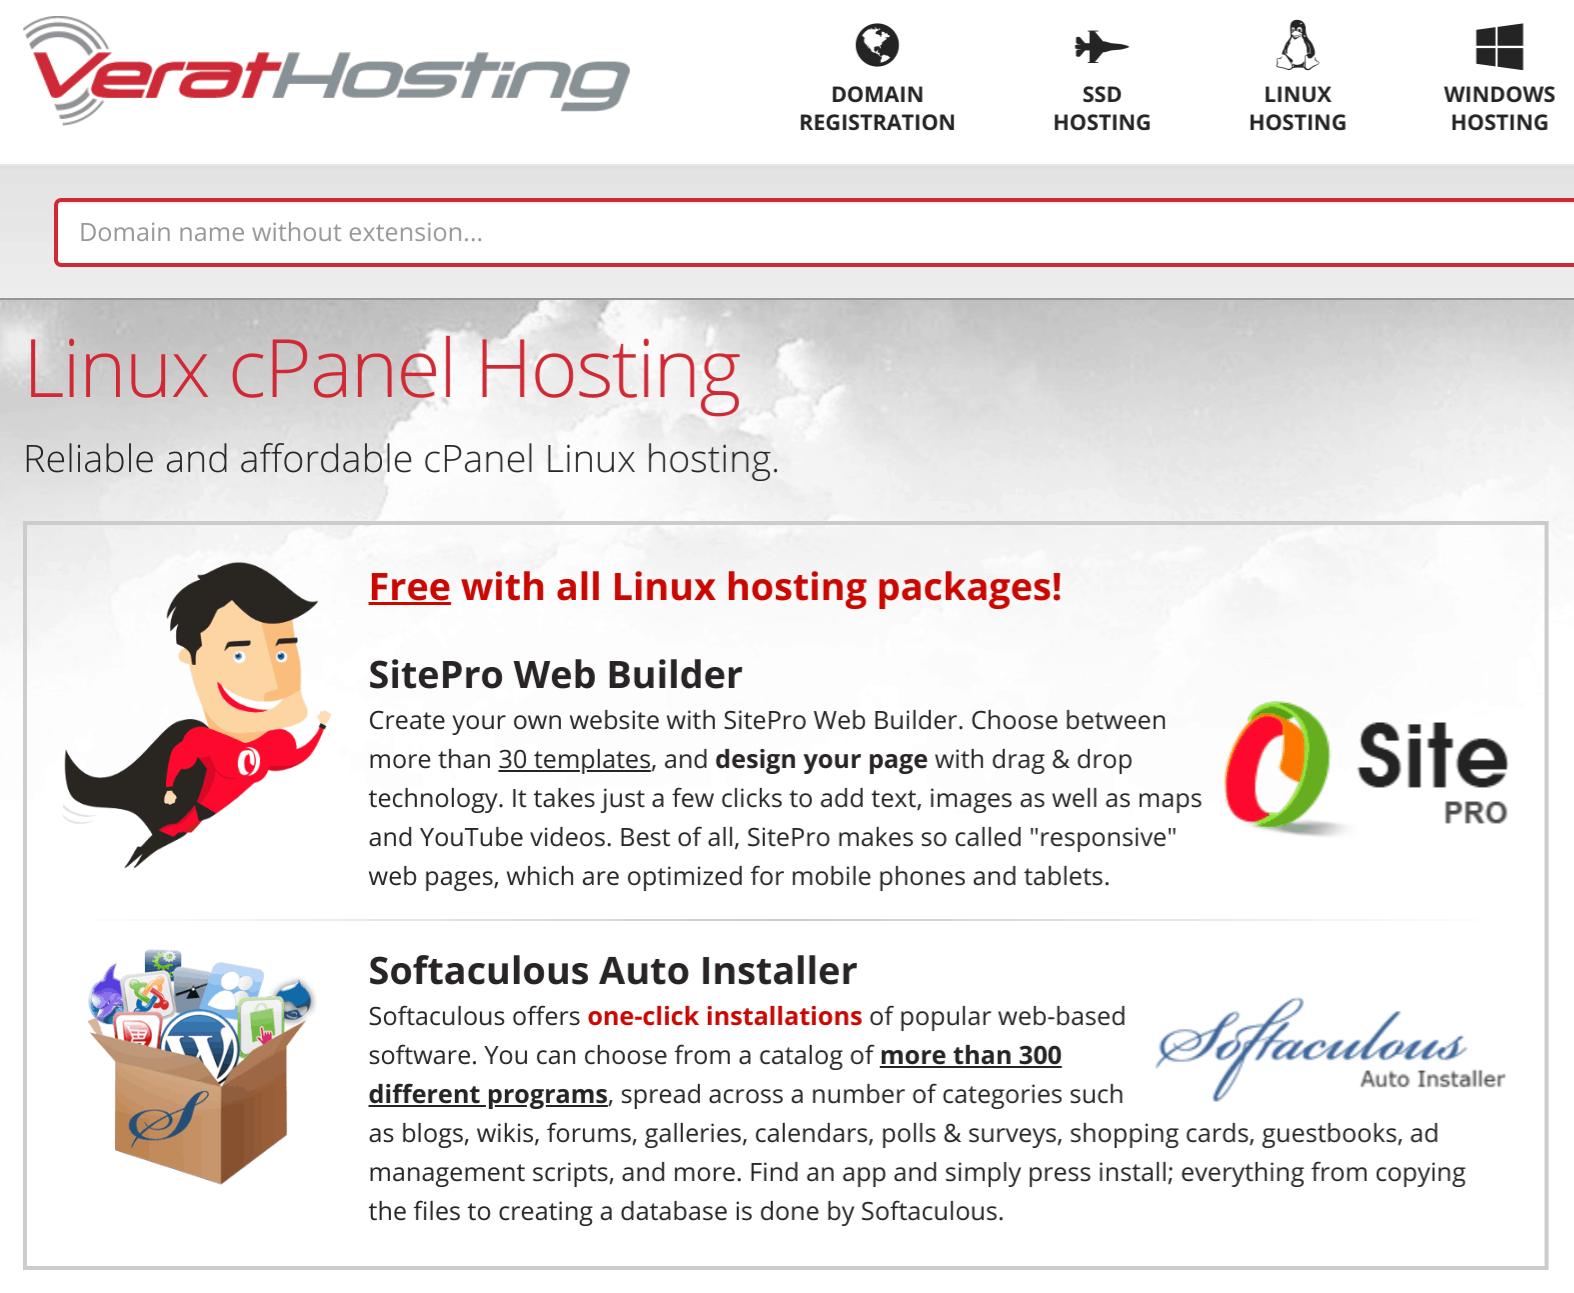 Verat-Hosting-overview1